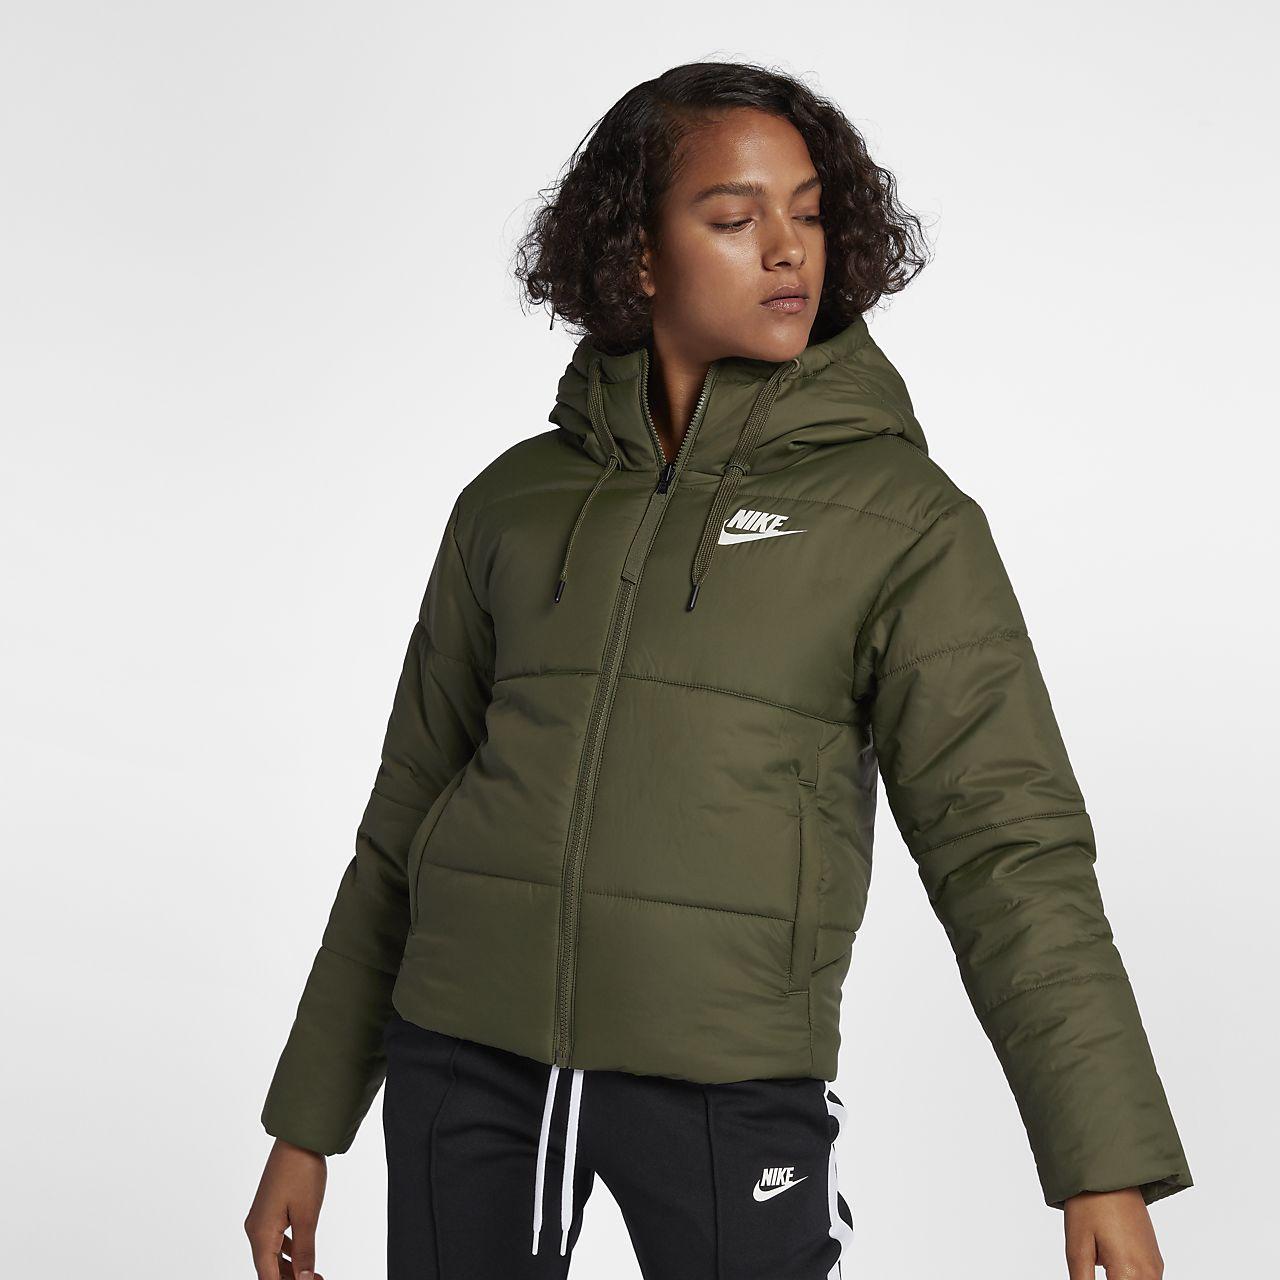 Veste réversible Nike Sportswear Synthetic-Fill pour Femme